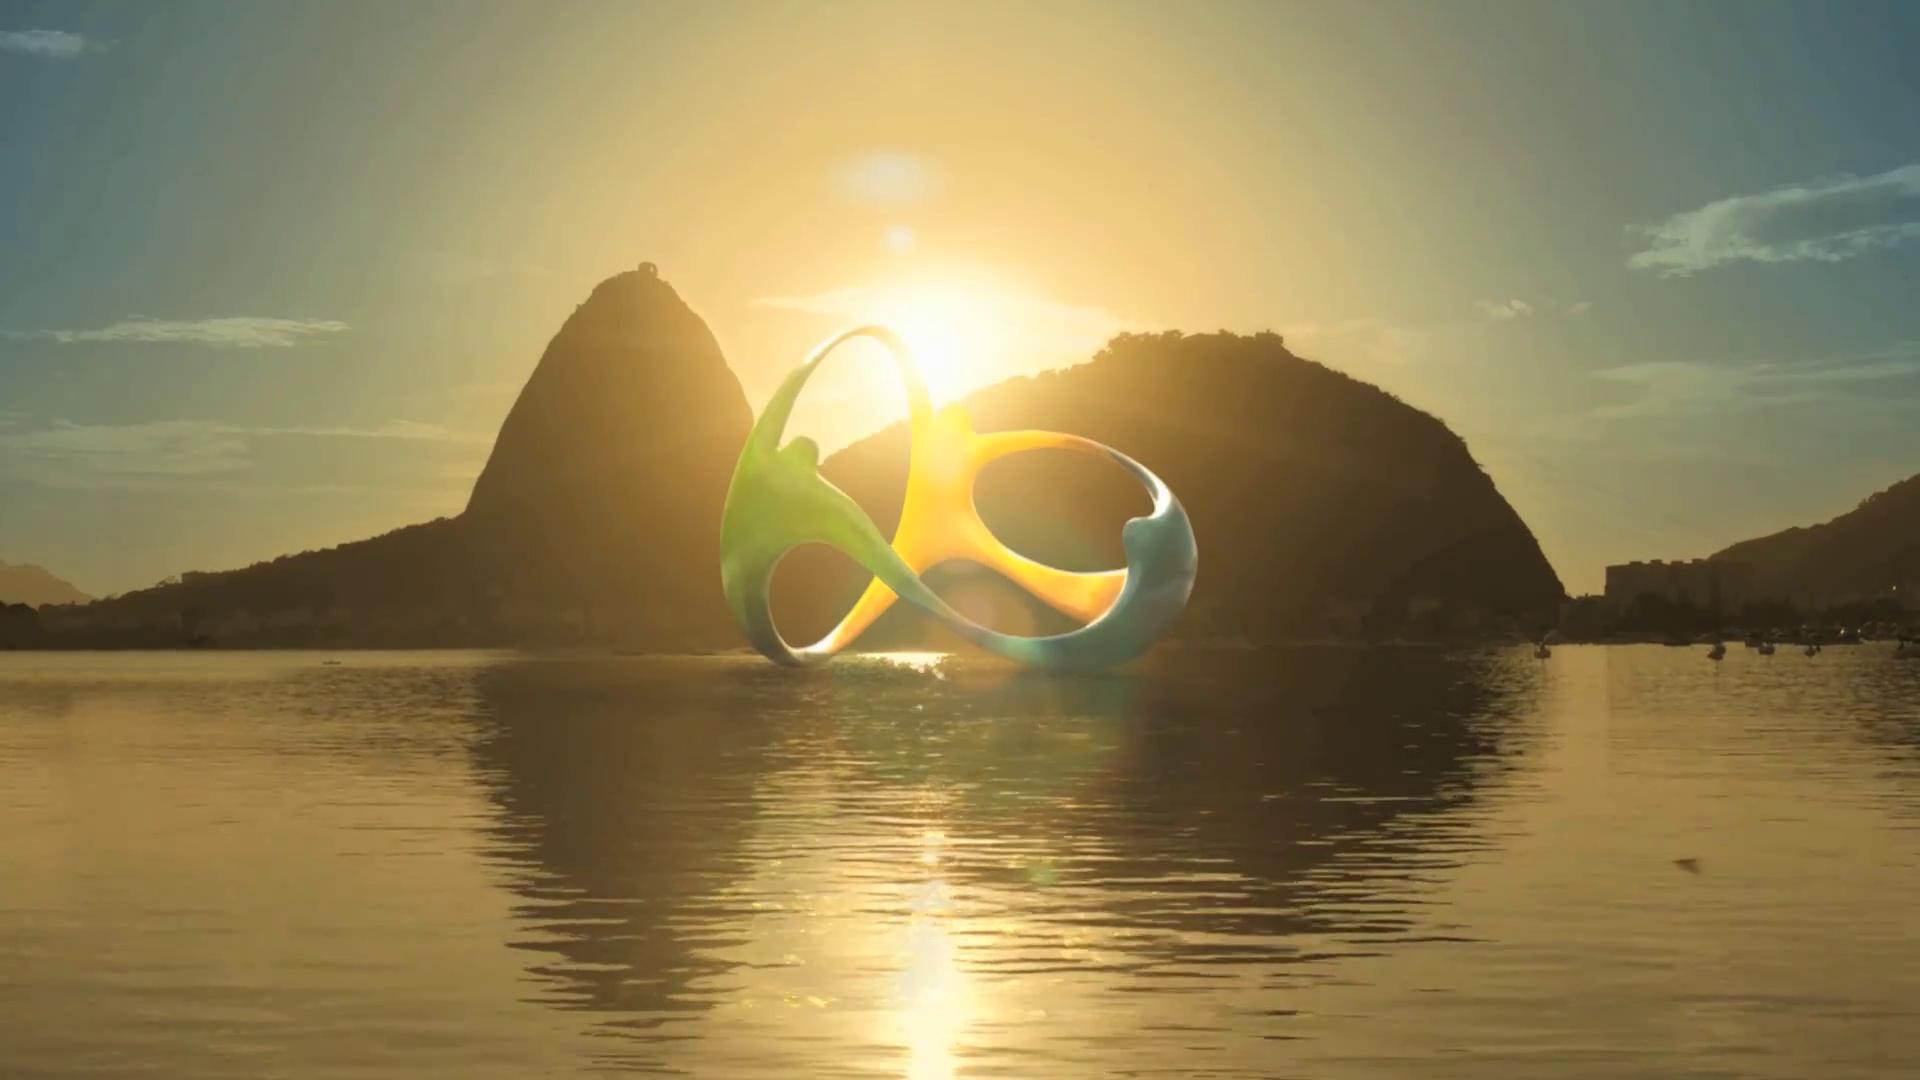 Rio_2016_logo_on_water